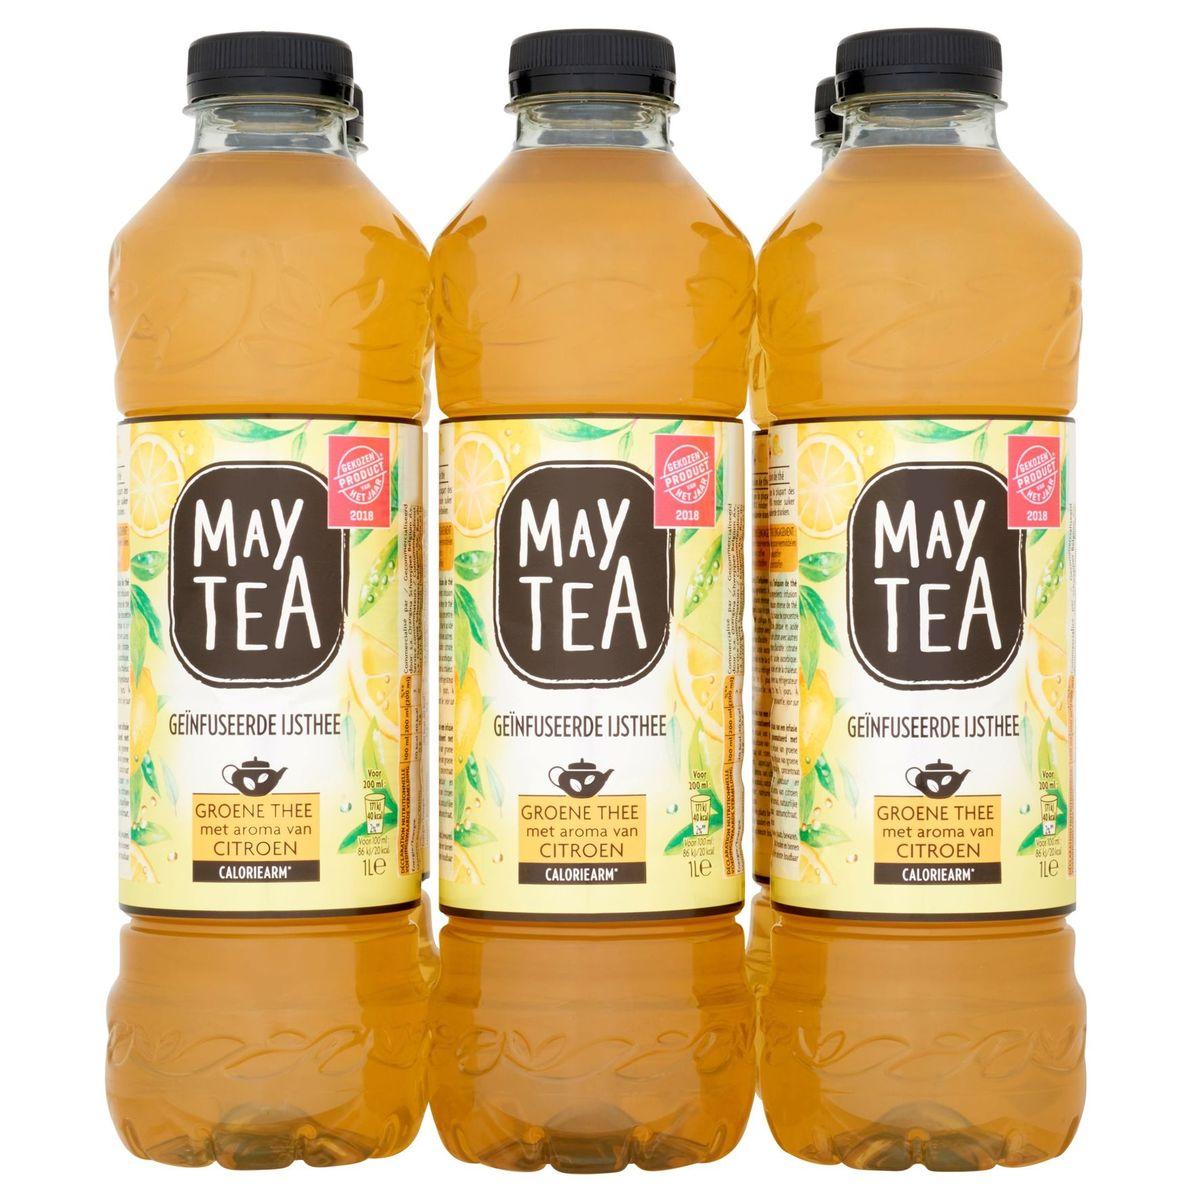 May Tea Geïnfuseerde Ijsthee Groene Thee met Aroma van Citroen  6 x 1 L